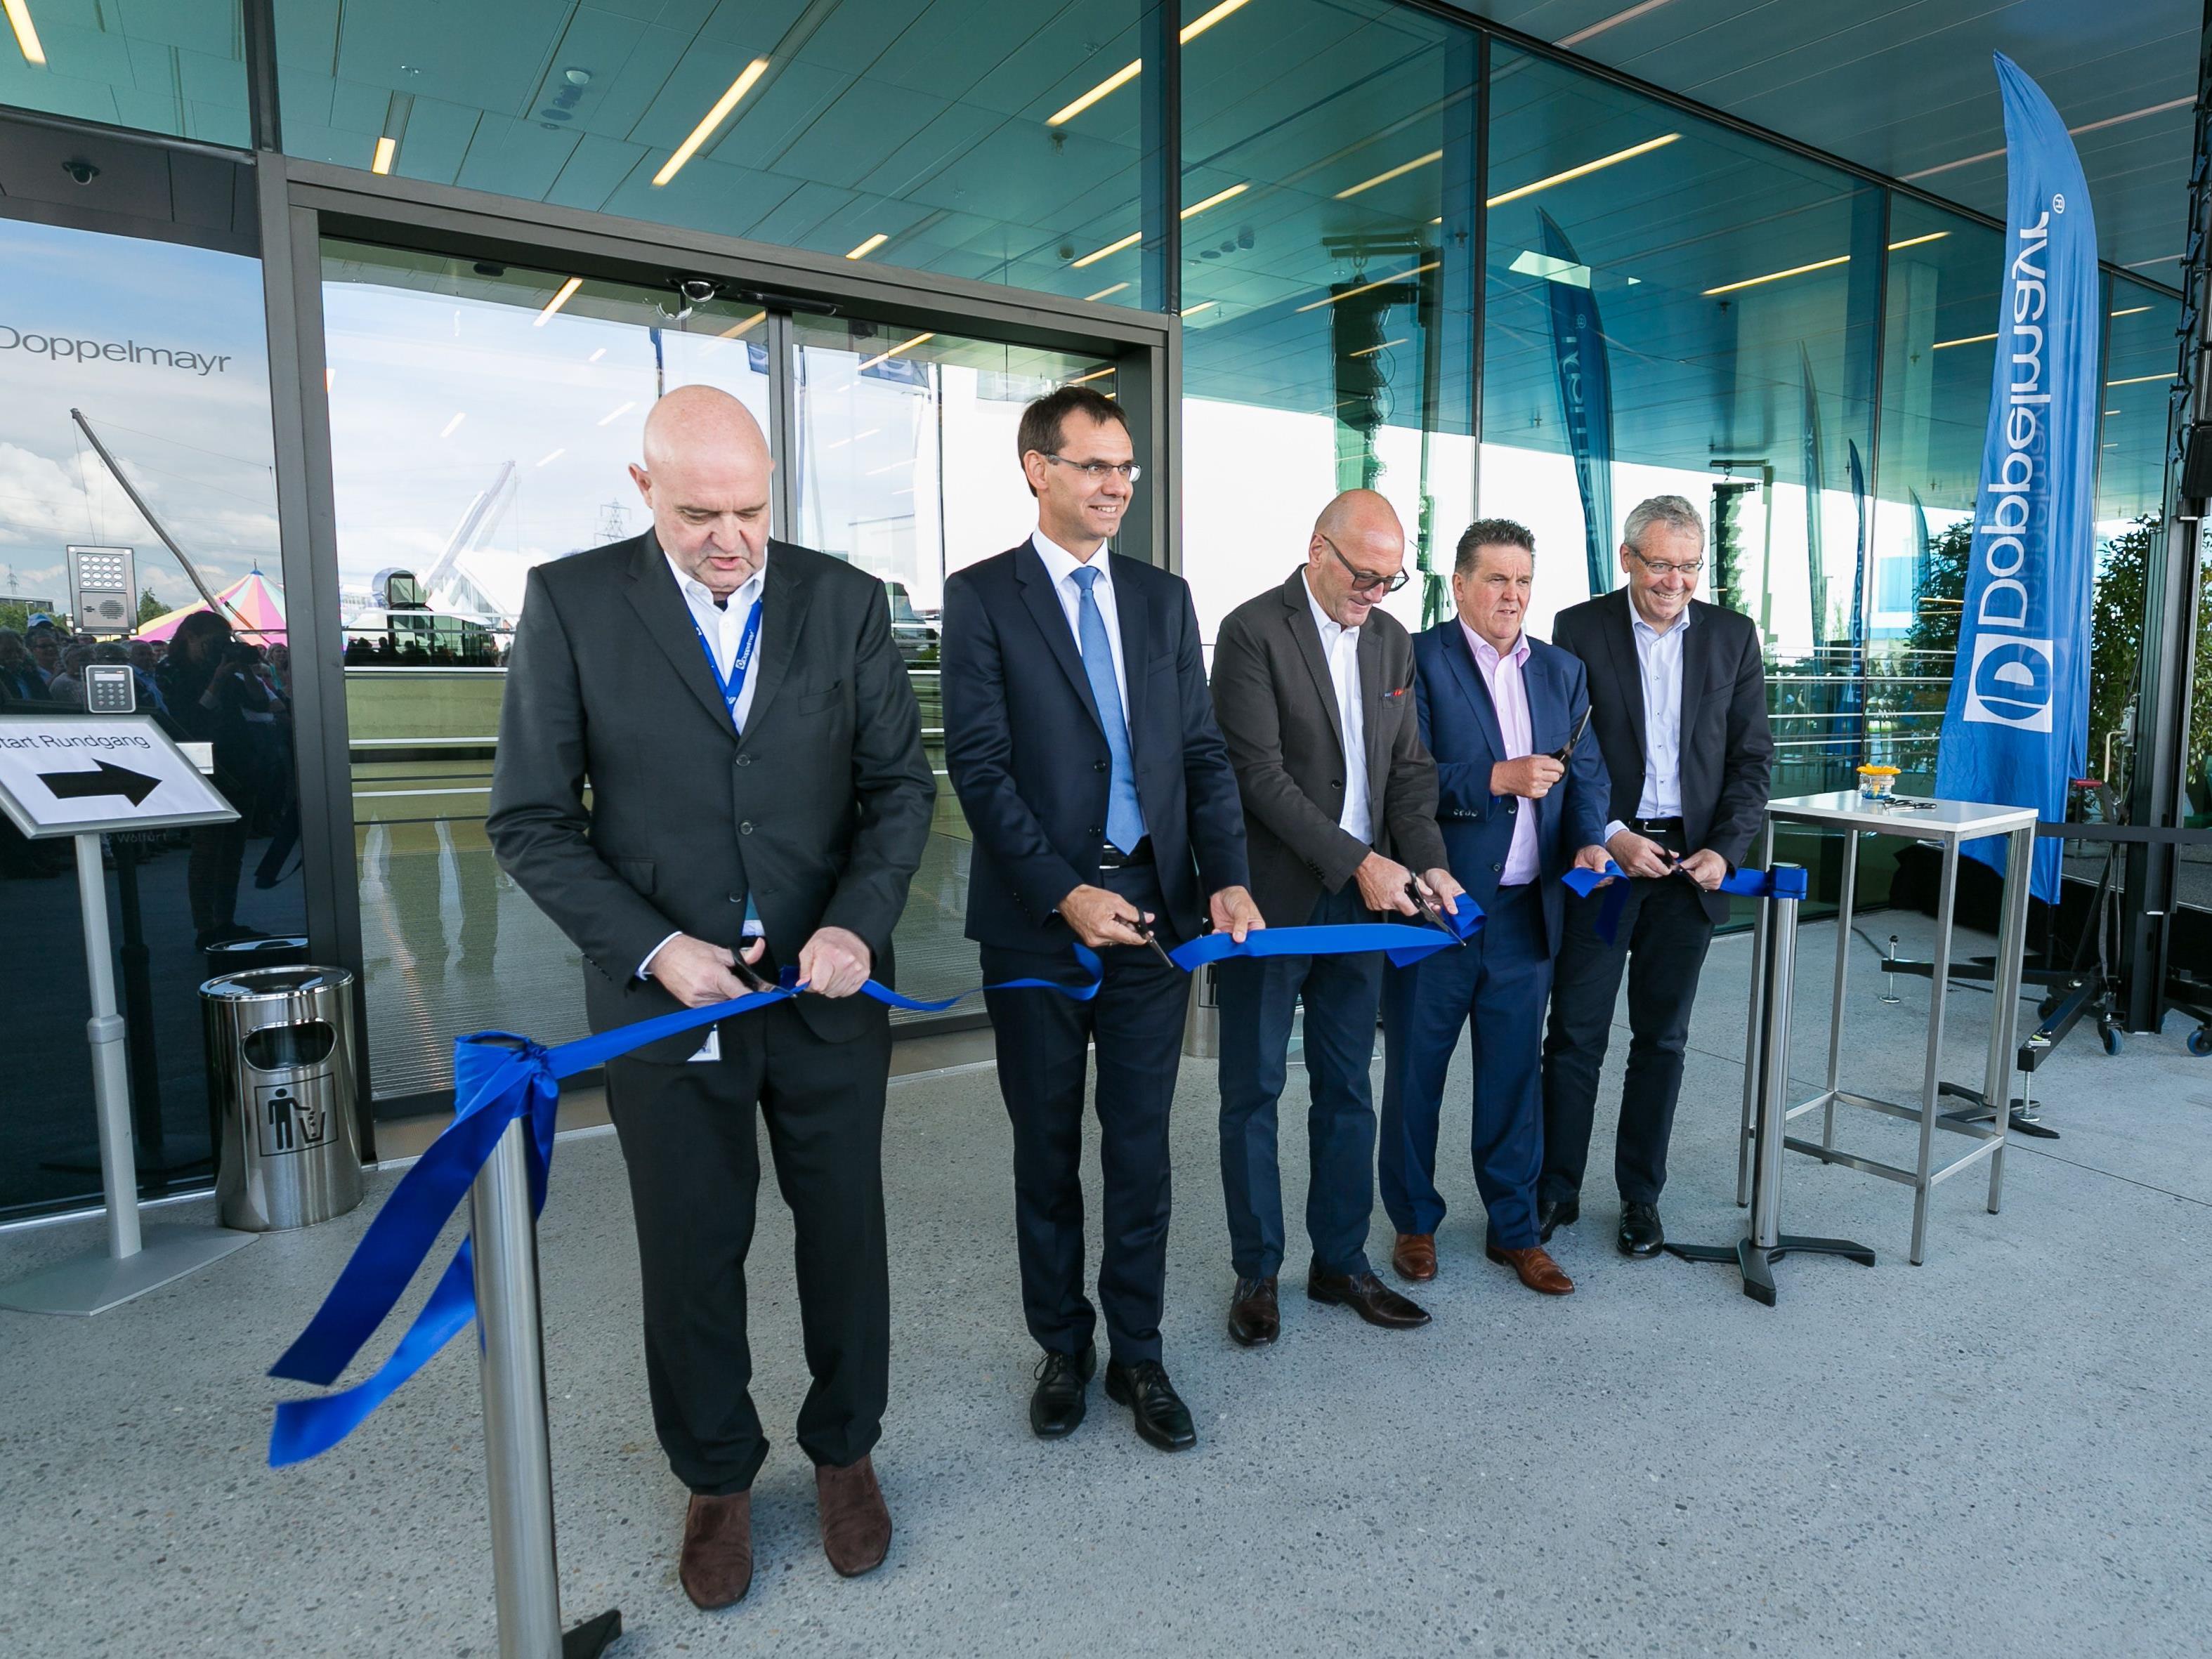 Doppelmayr eröffnet neues Bürogebäude